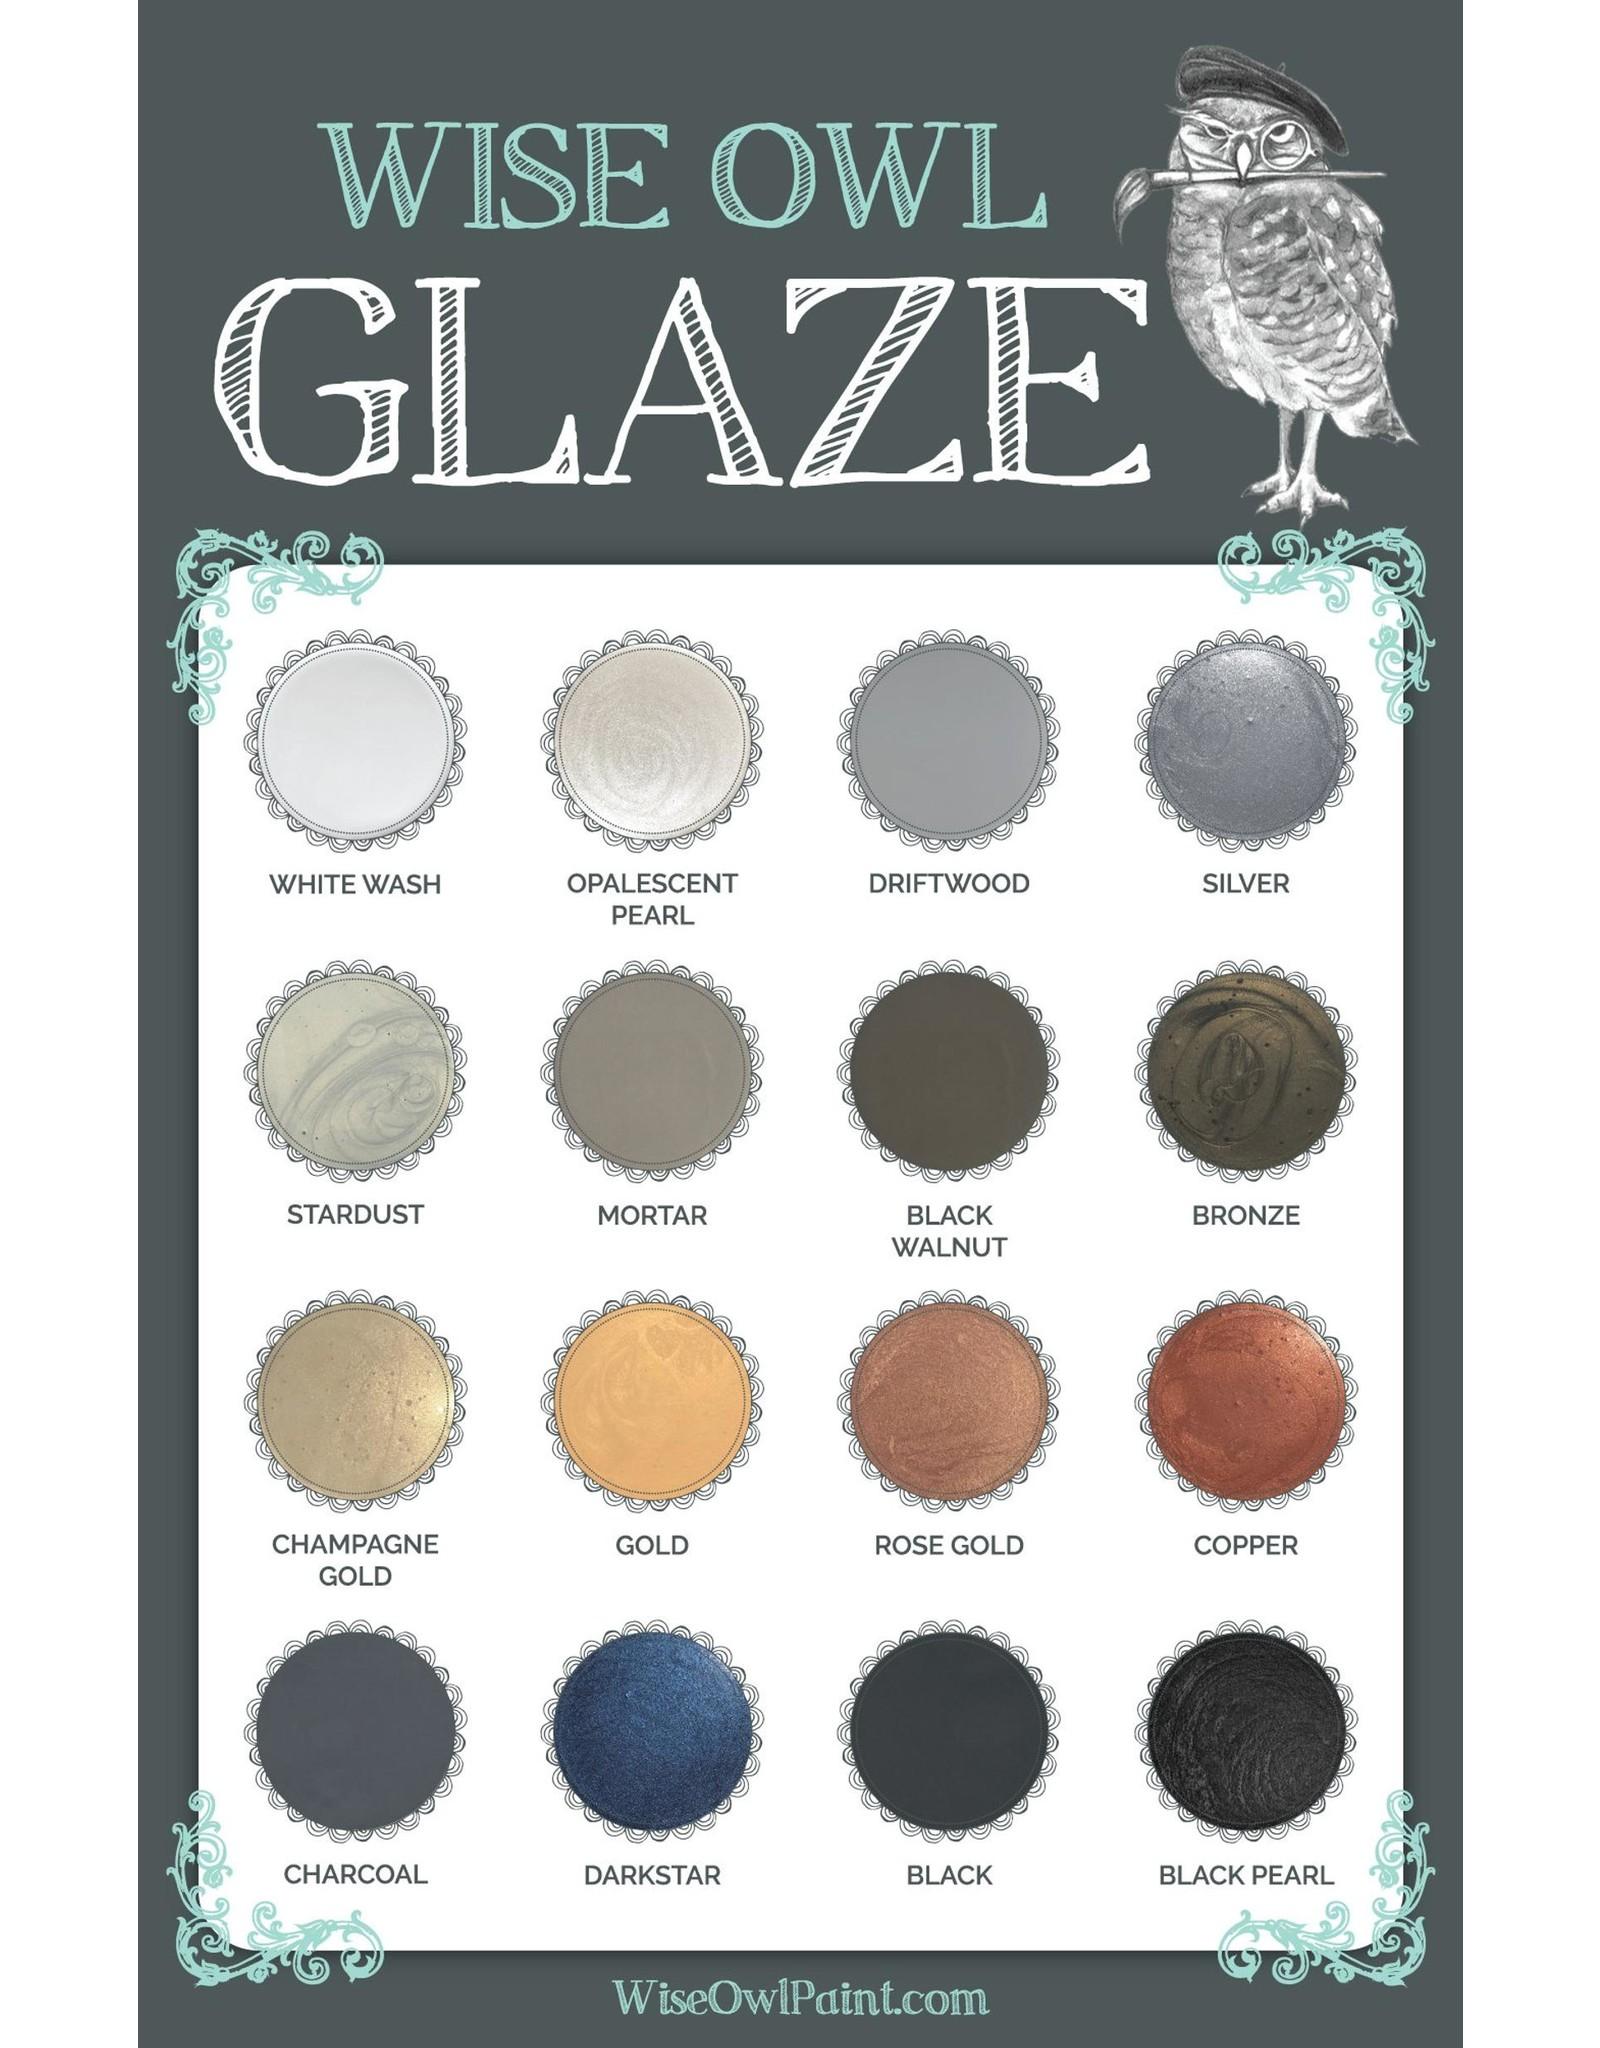 Wise Owl Paint Charcoal Glaze 8oz